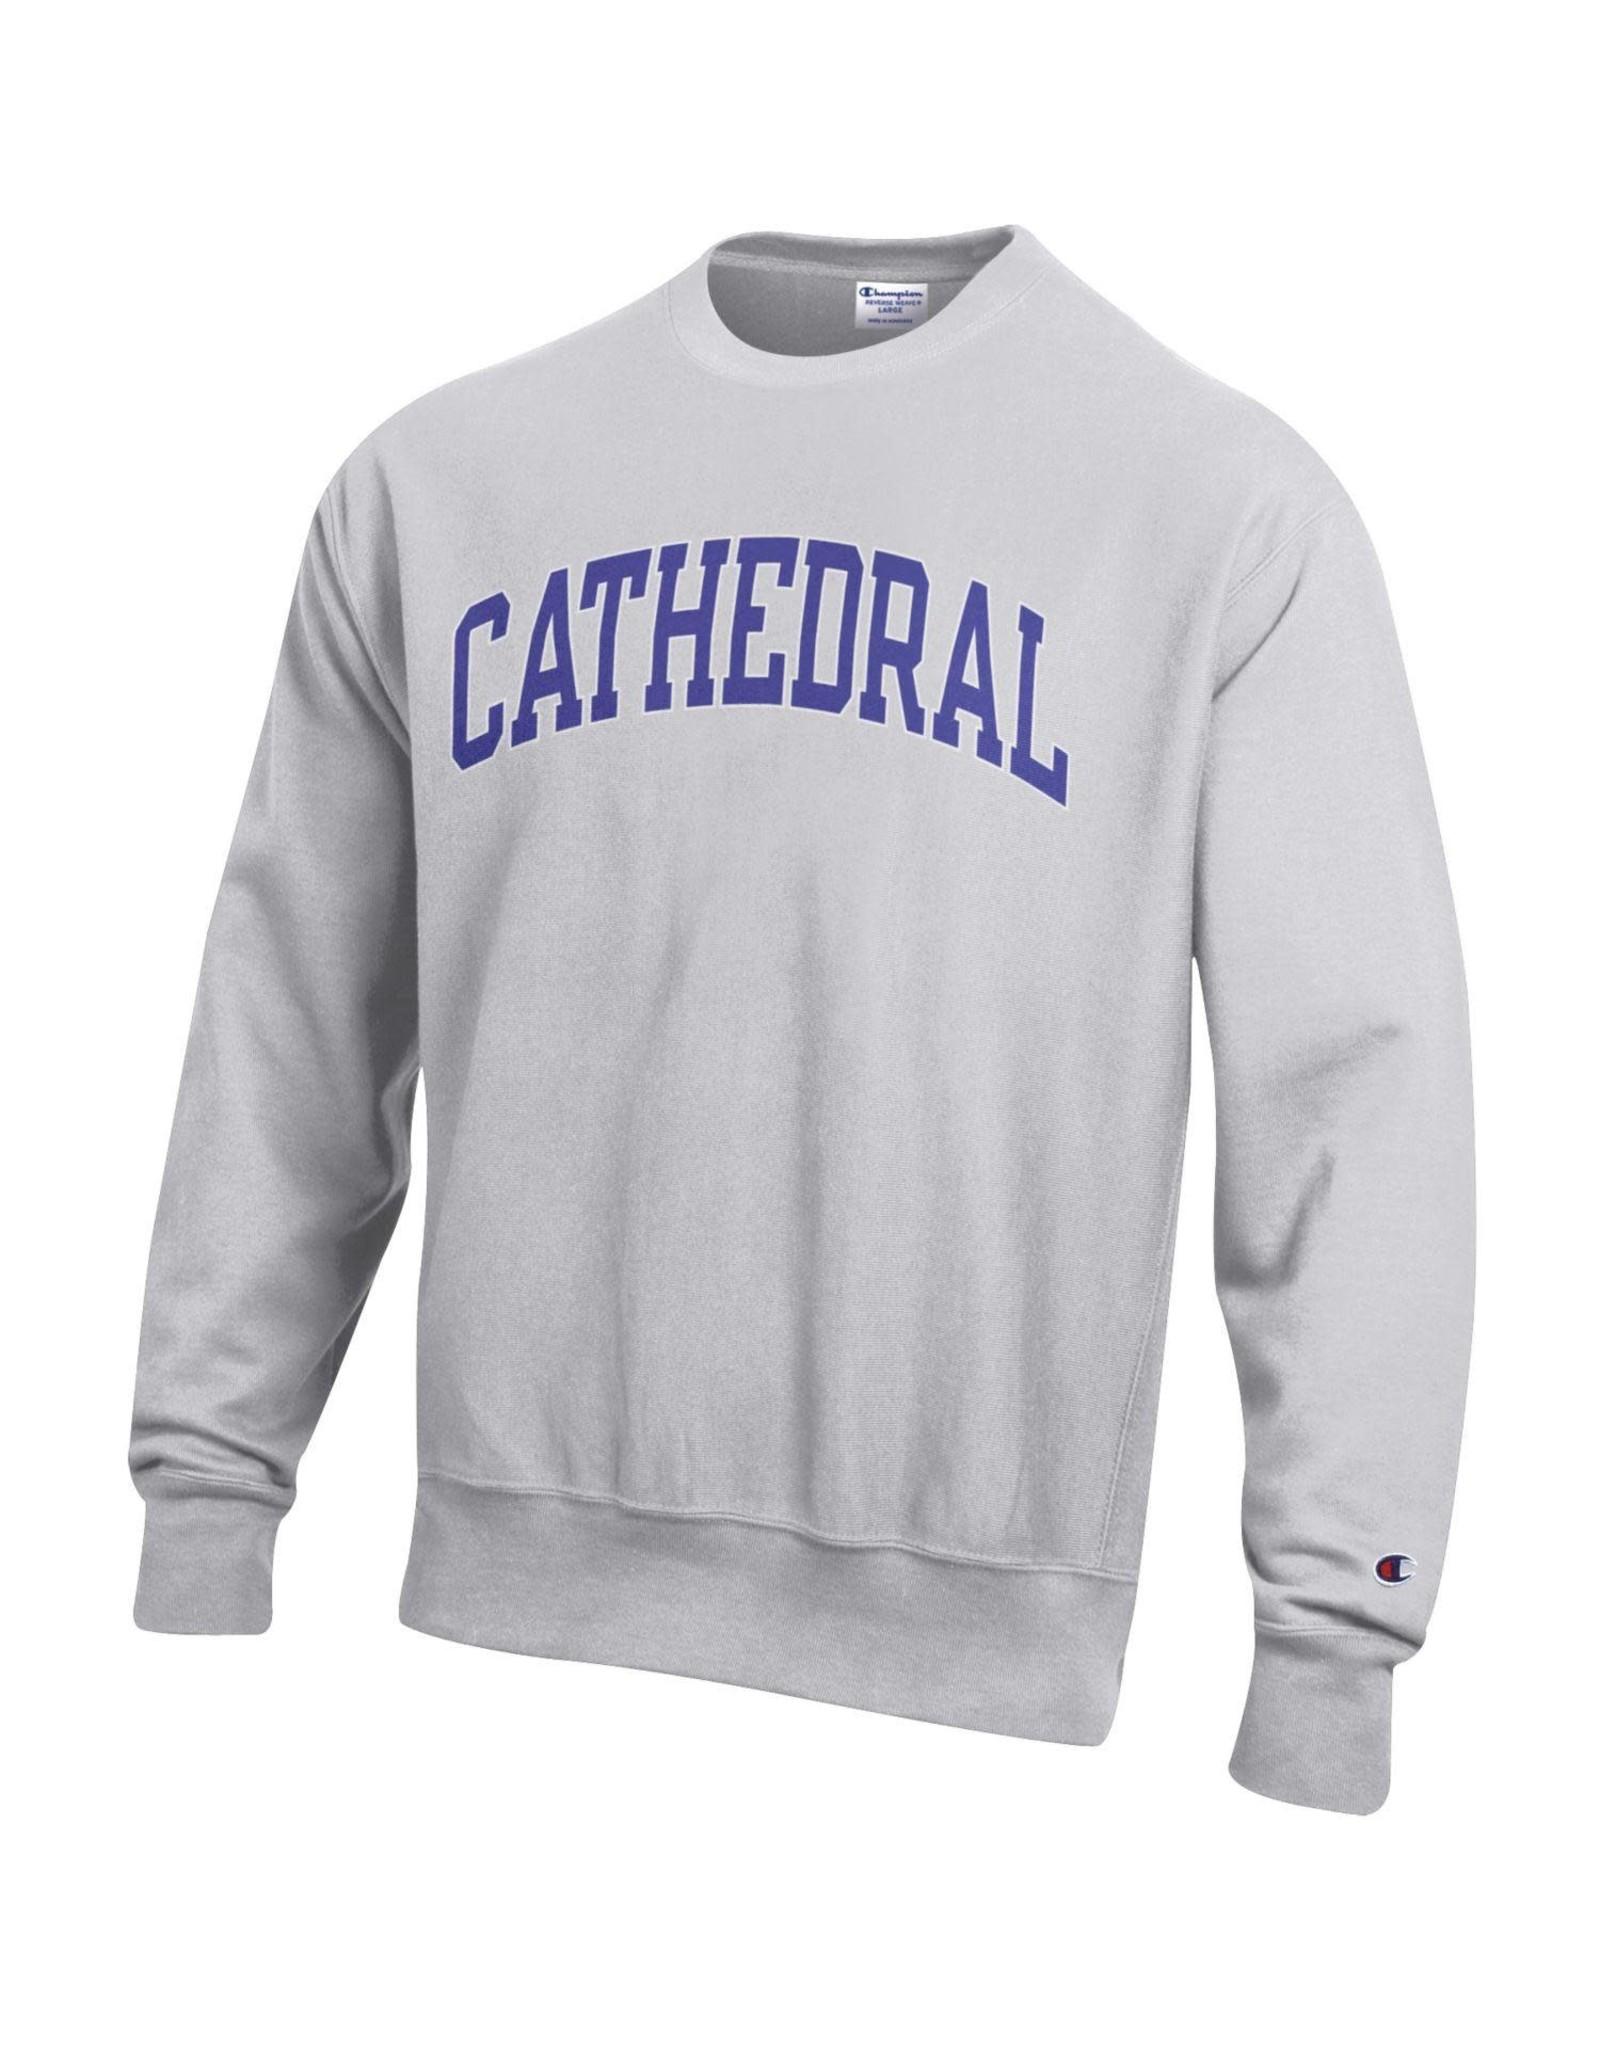 SWEATSHIRT-CREW CATHEDRAL